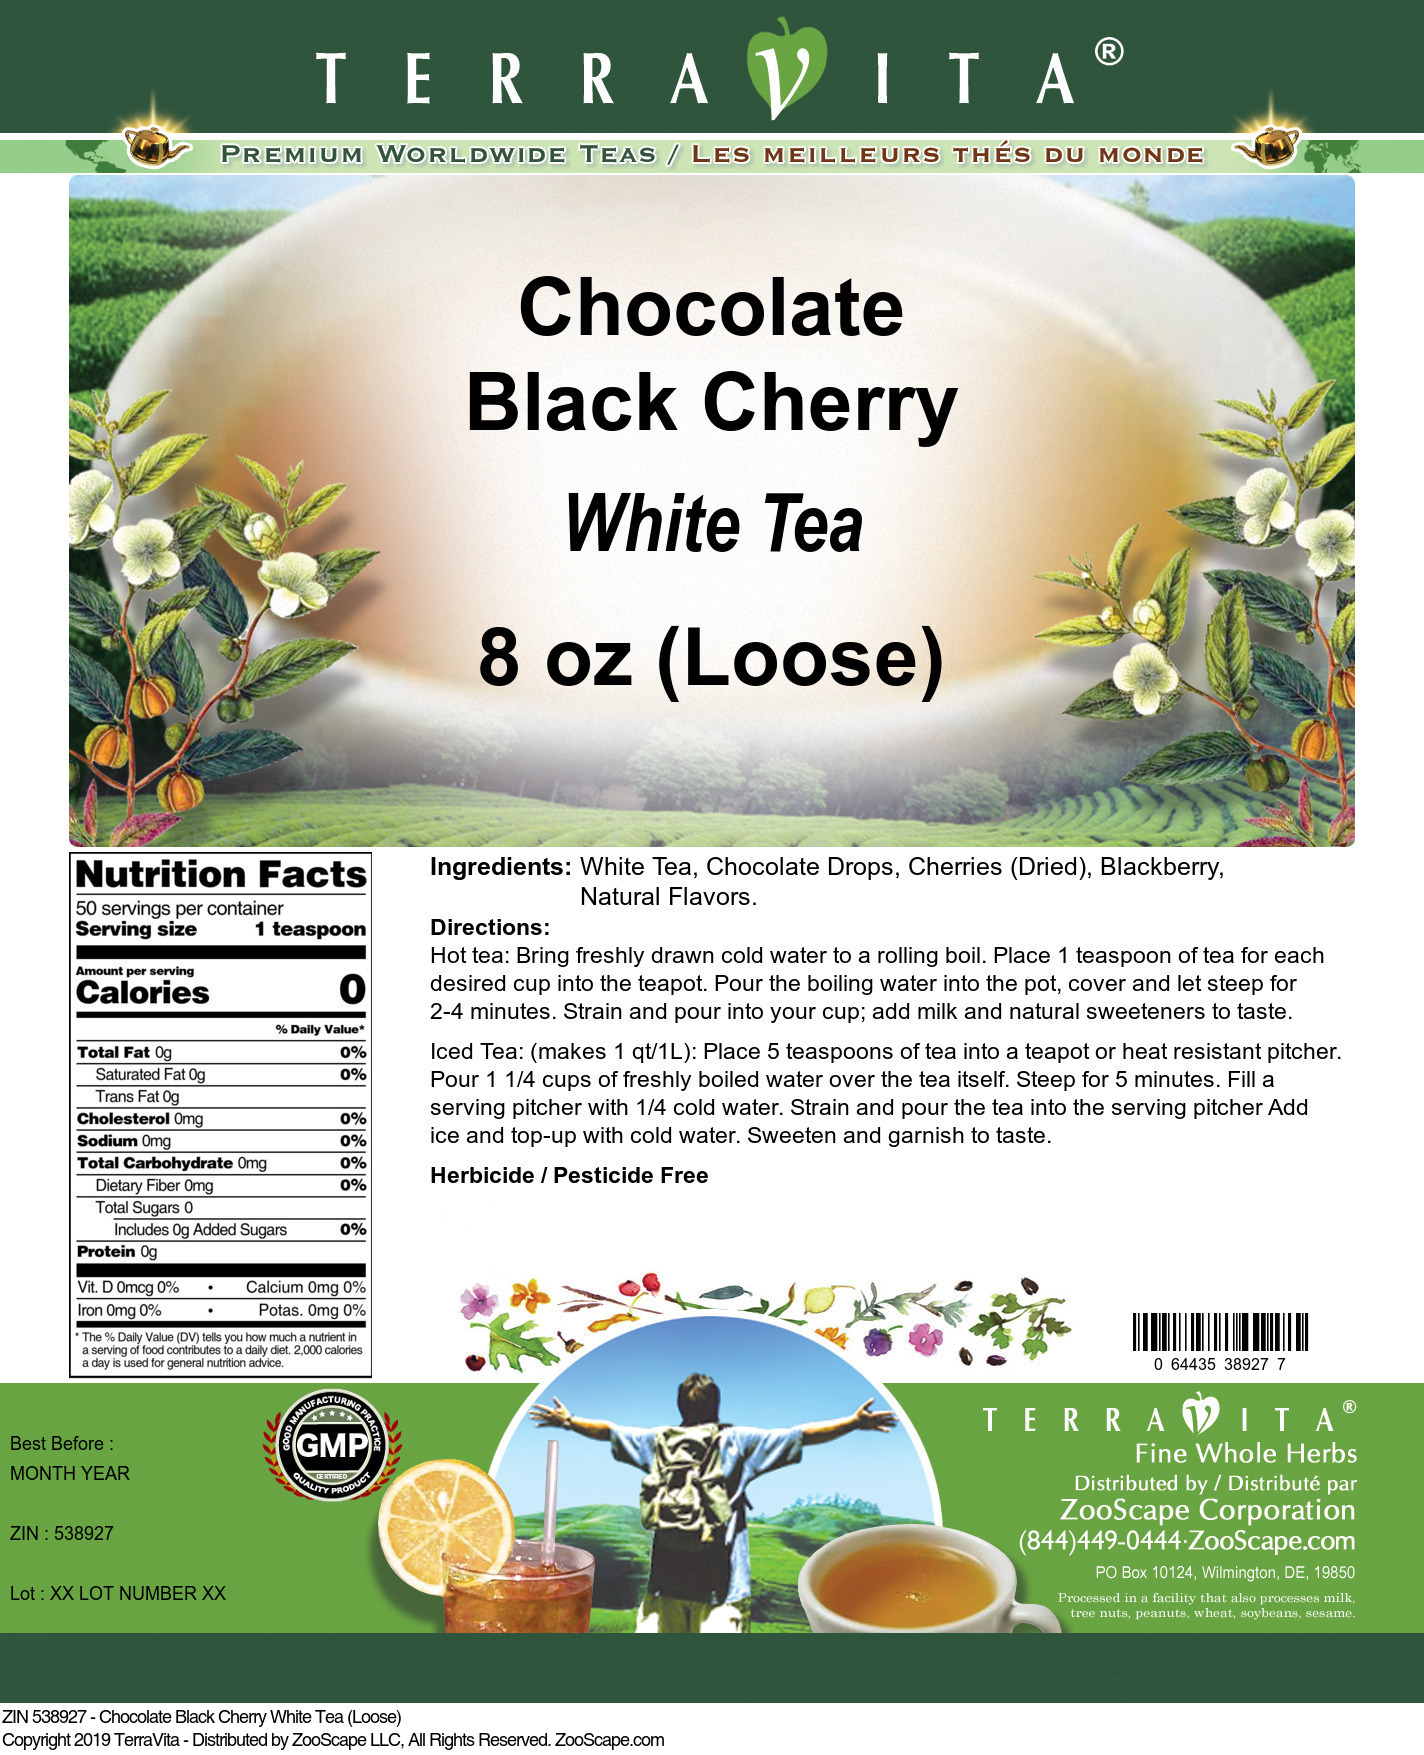 Chocolate Black Cherry White Tea